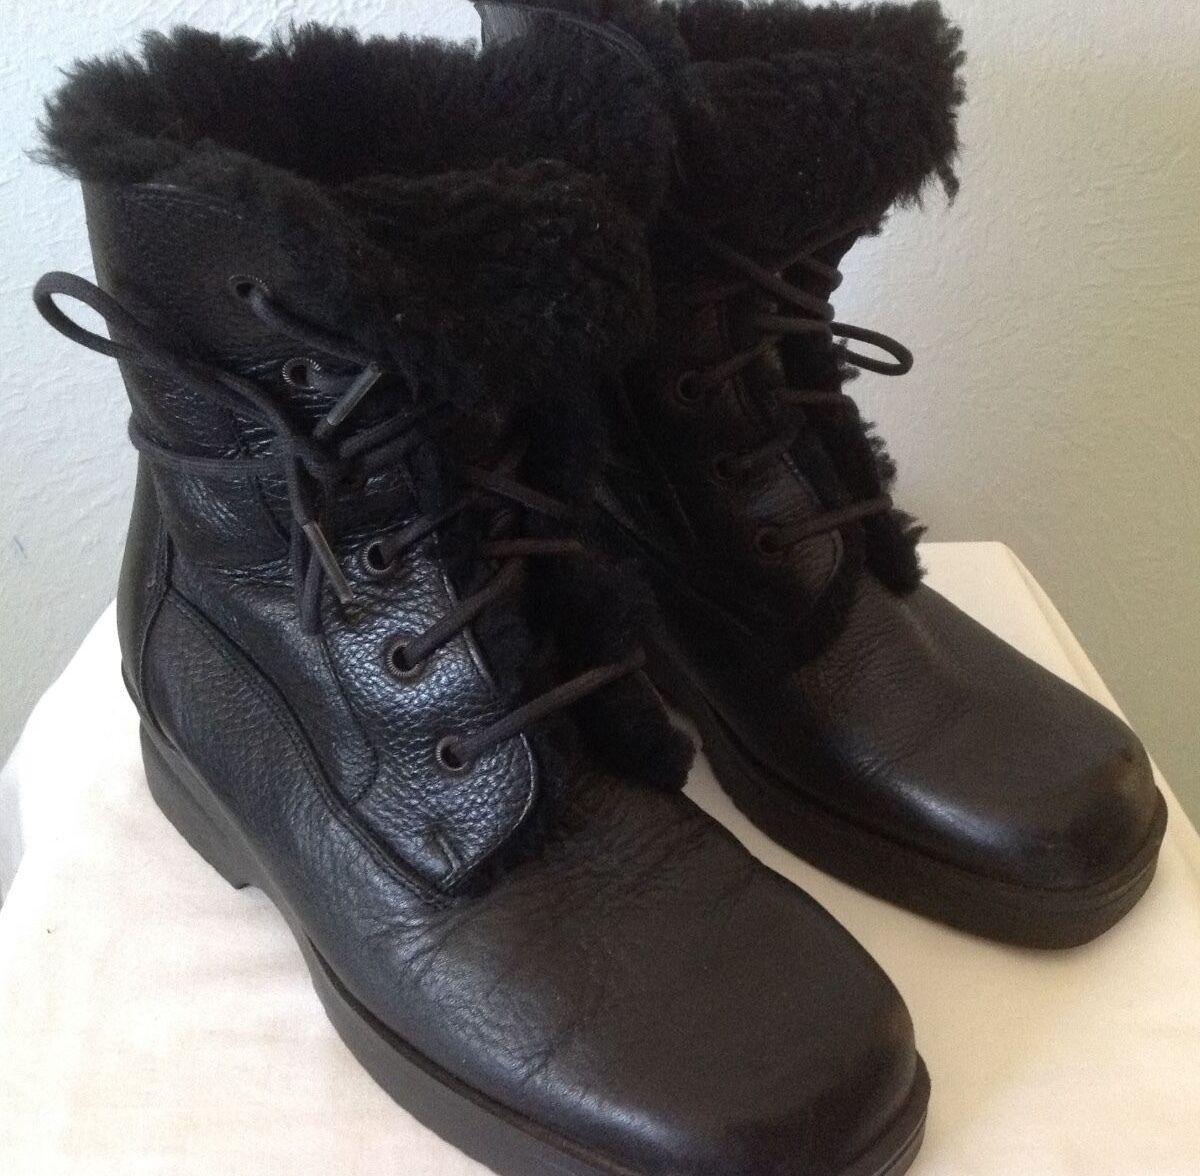 *37* SANTANA Canada Leather Boots Fur Sheepskin Shearling Weatherproof Boots Leather 98c2d6